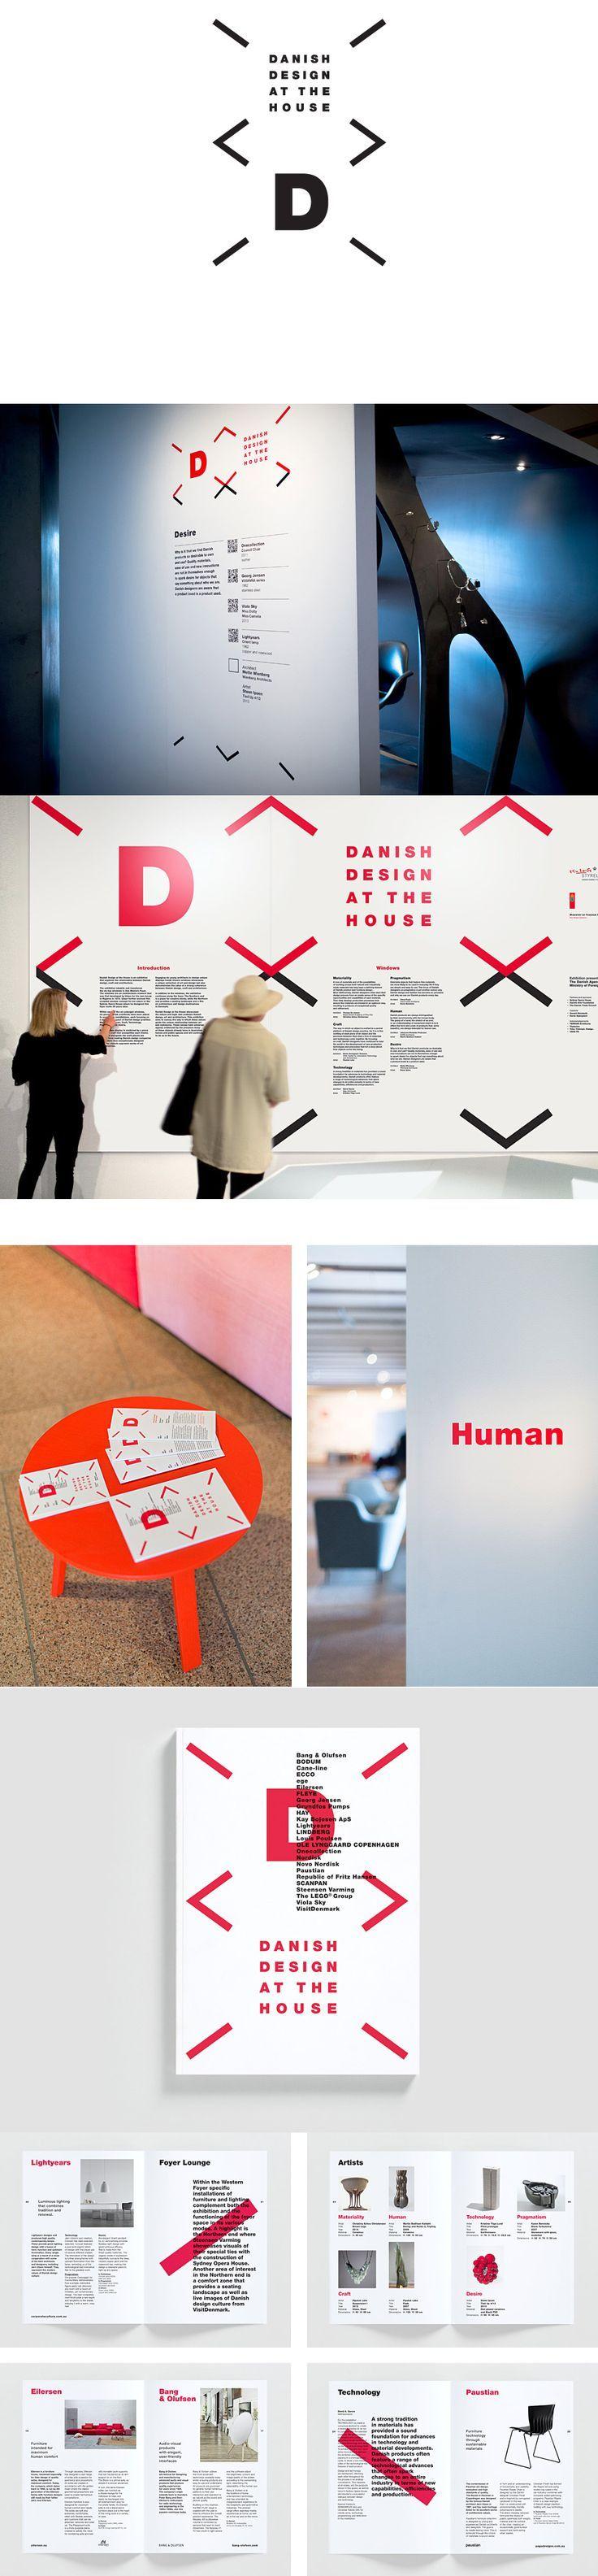 Scandi scandi design identit visuelle graphisme und for Buro design katalog